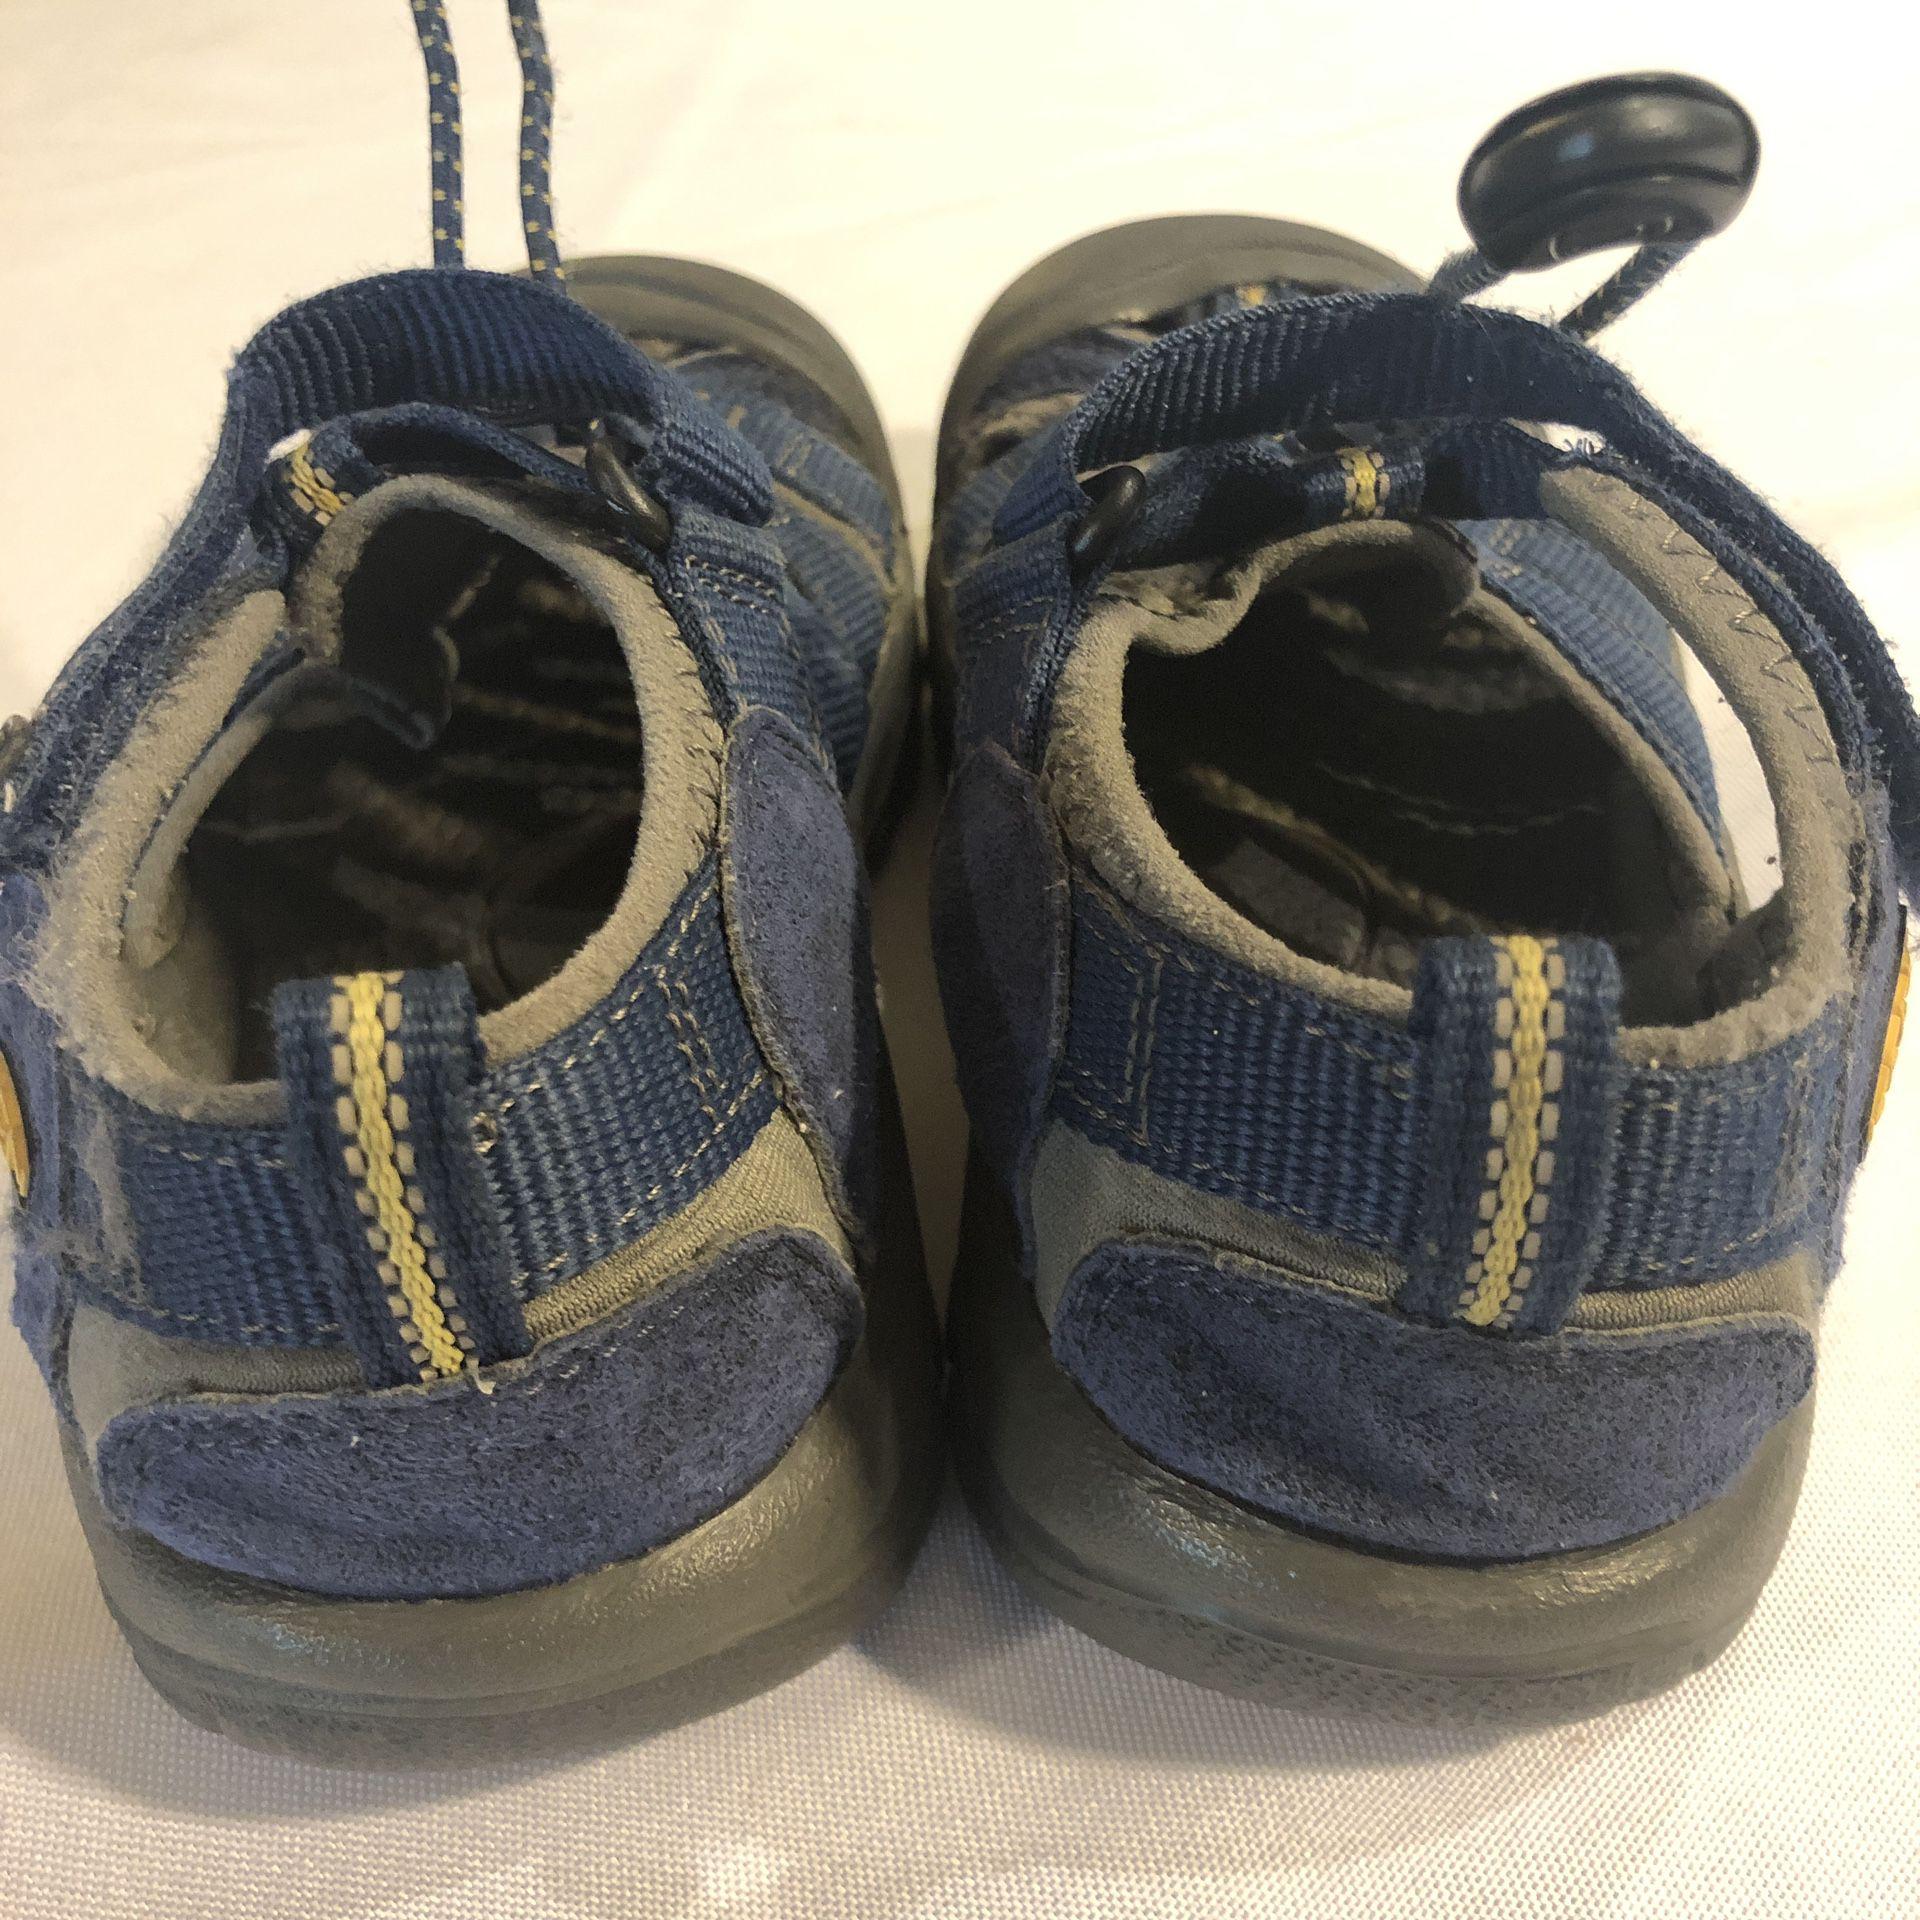 Keen Newport H2 Youth Kids Outdoor Waterproof Hiking Sandal Size 13 Navy Blue